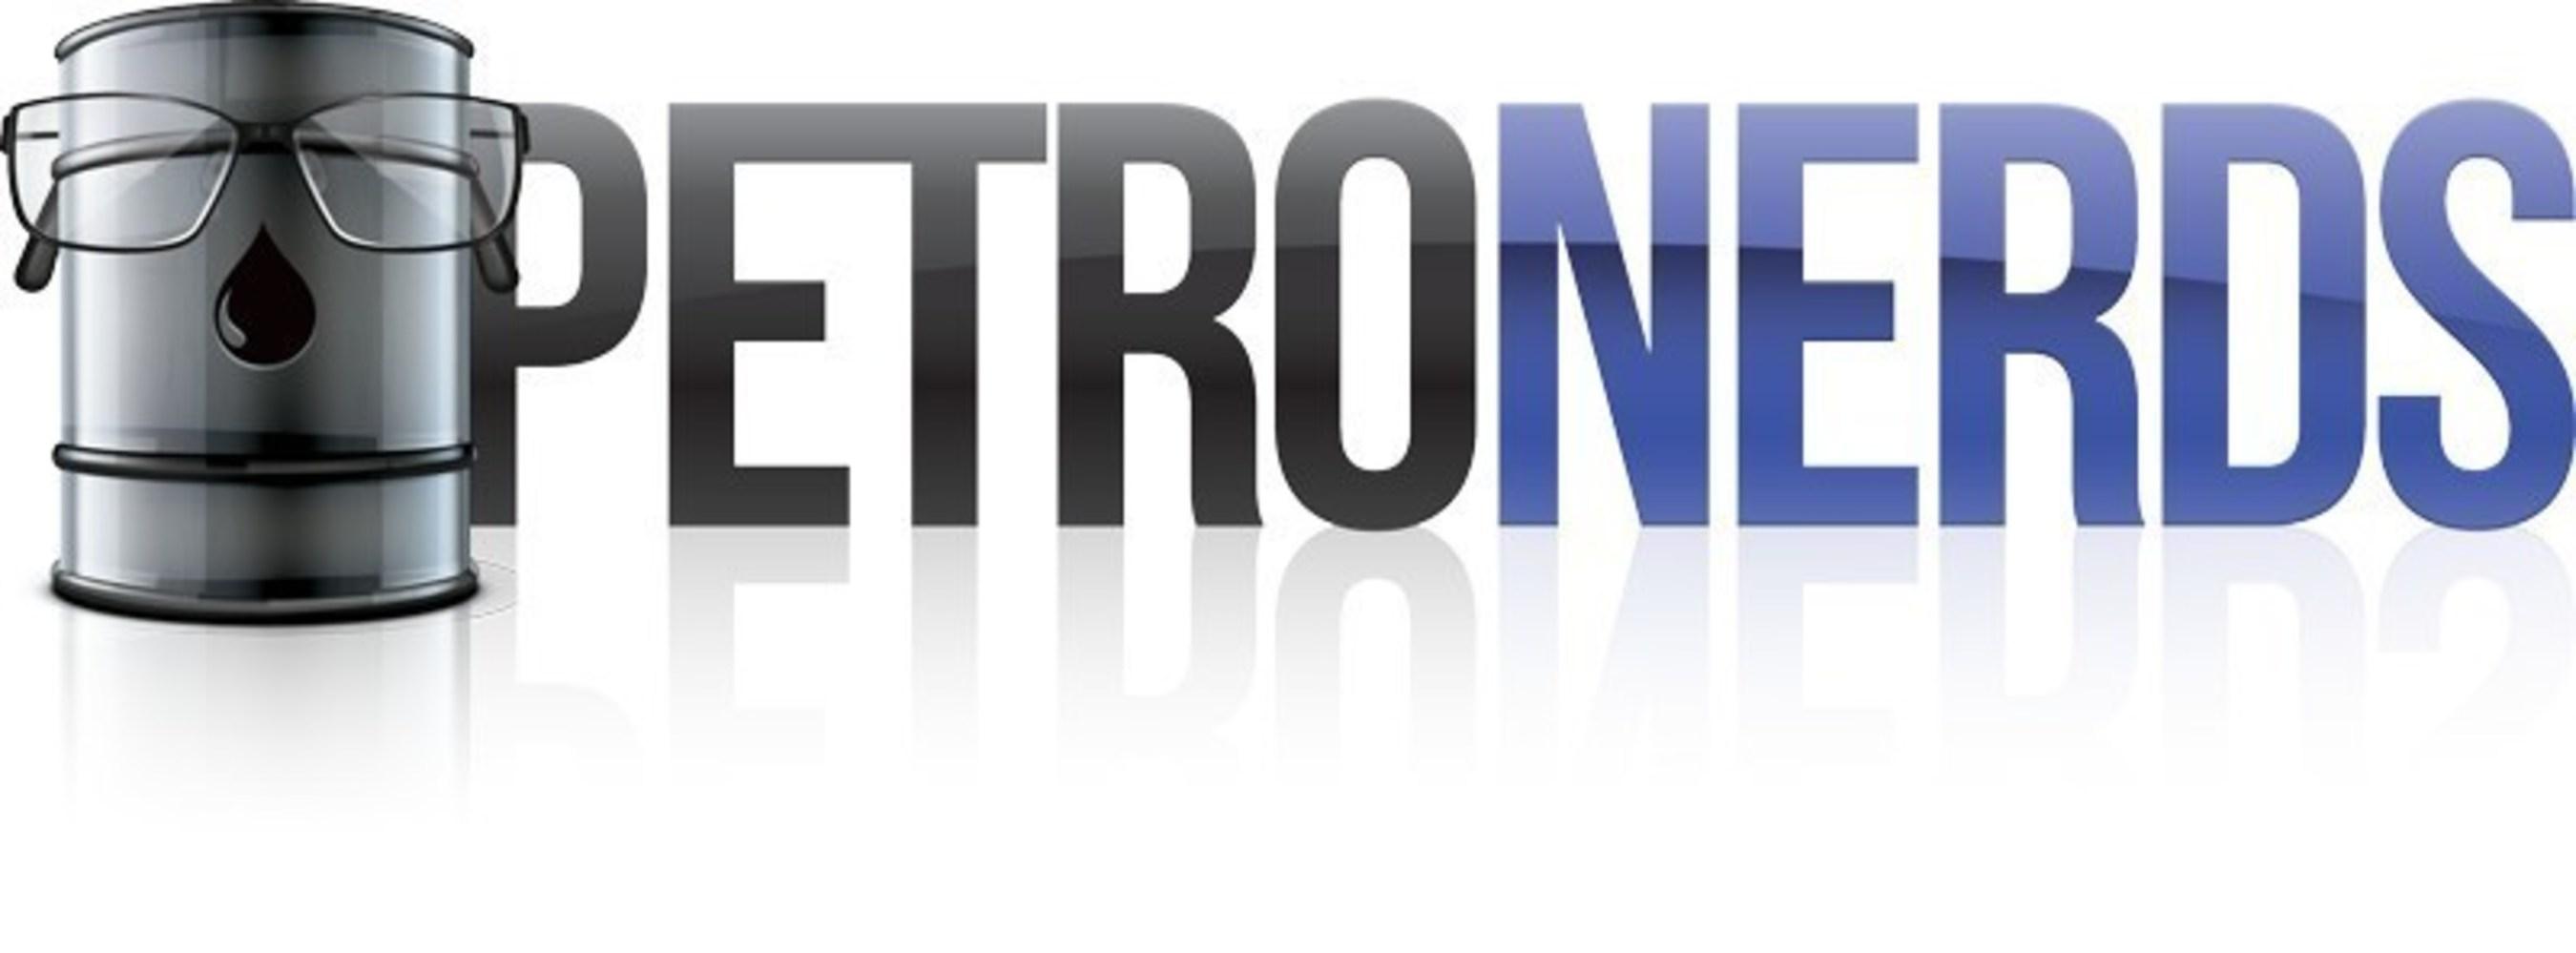 PetroNerds, LLC Logo